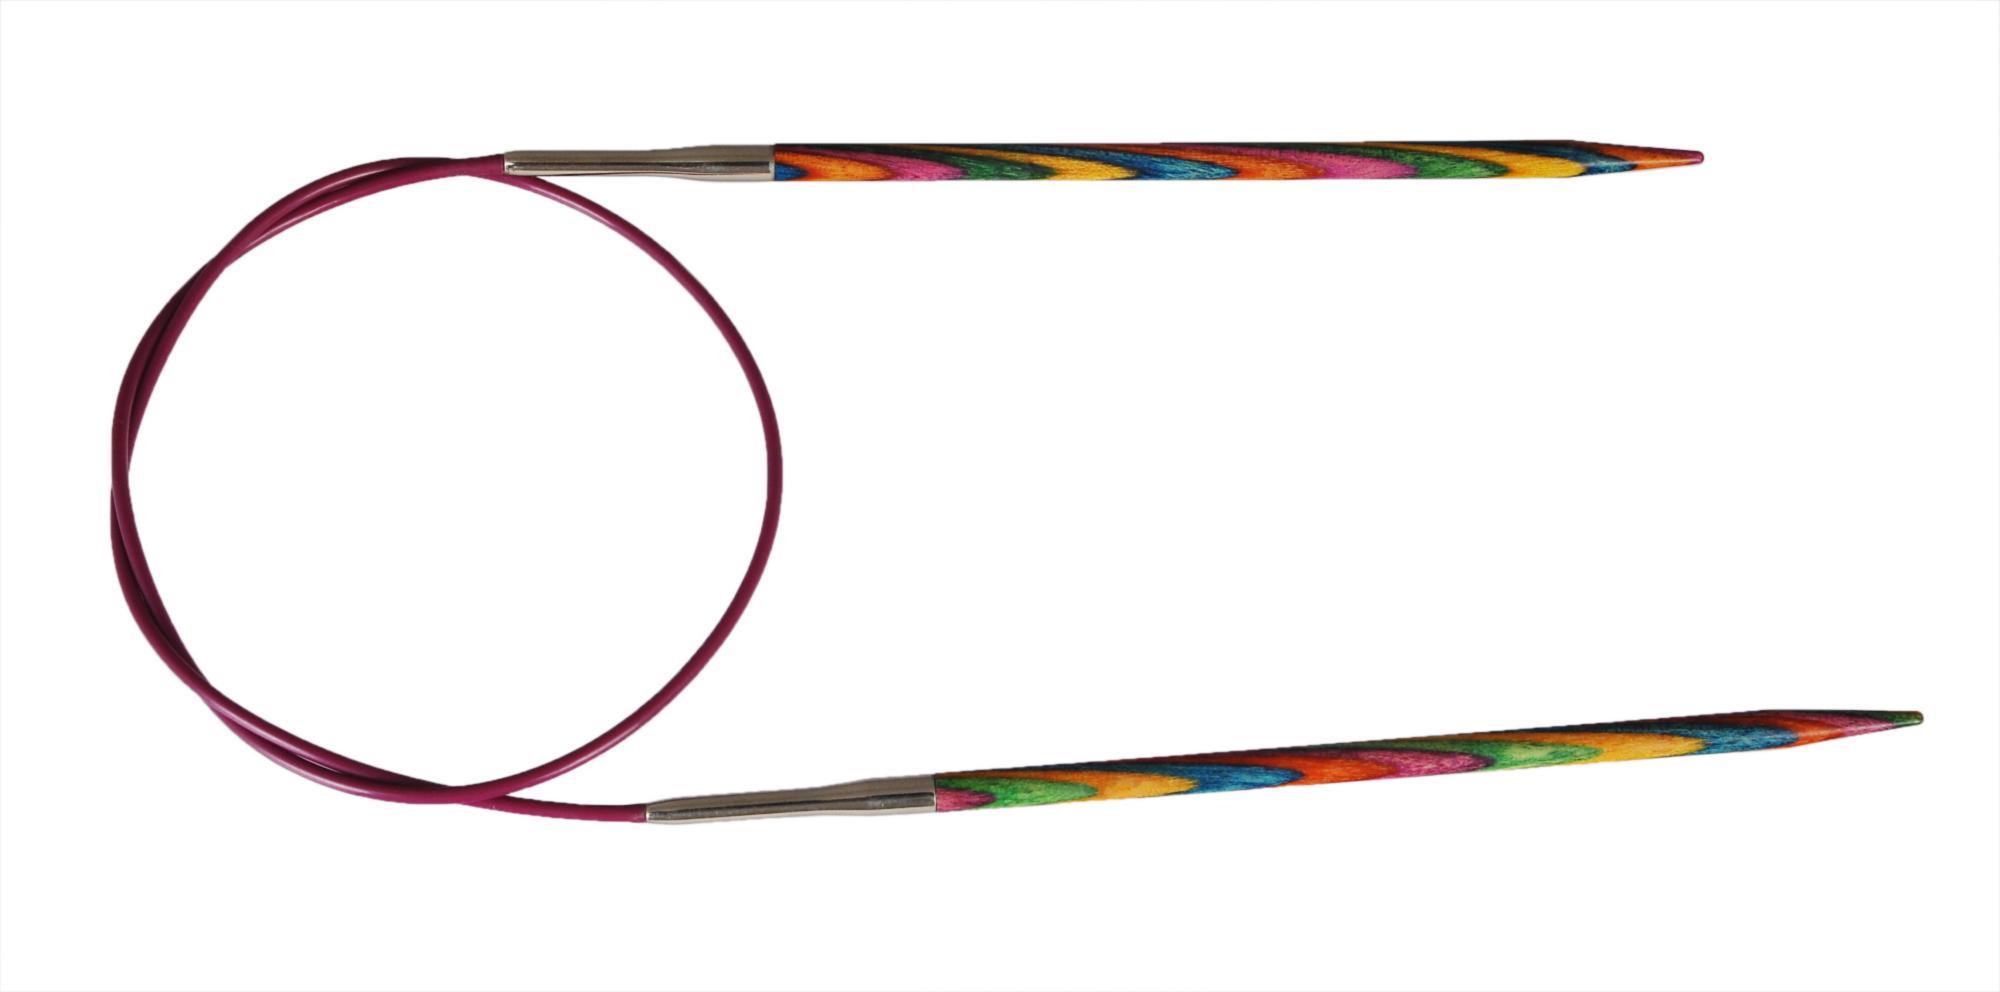 Спицы круговые 150 см Symfonie Wood KnitPro, 21388, 7.00 мм